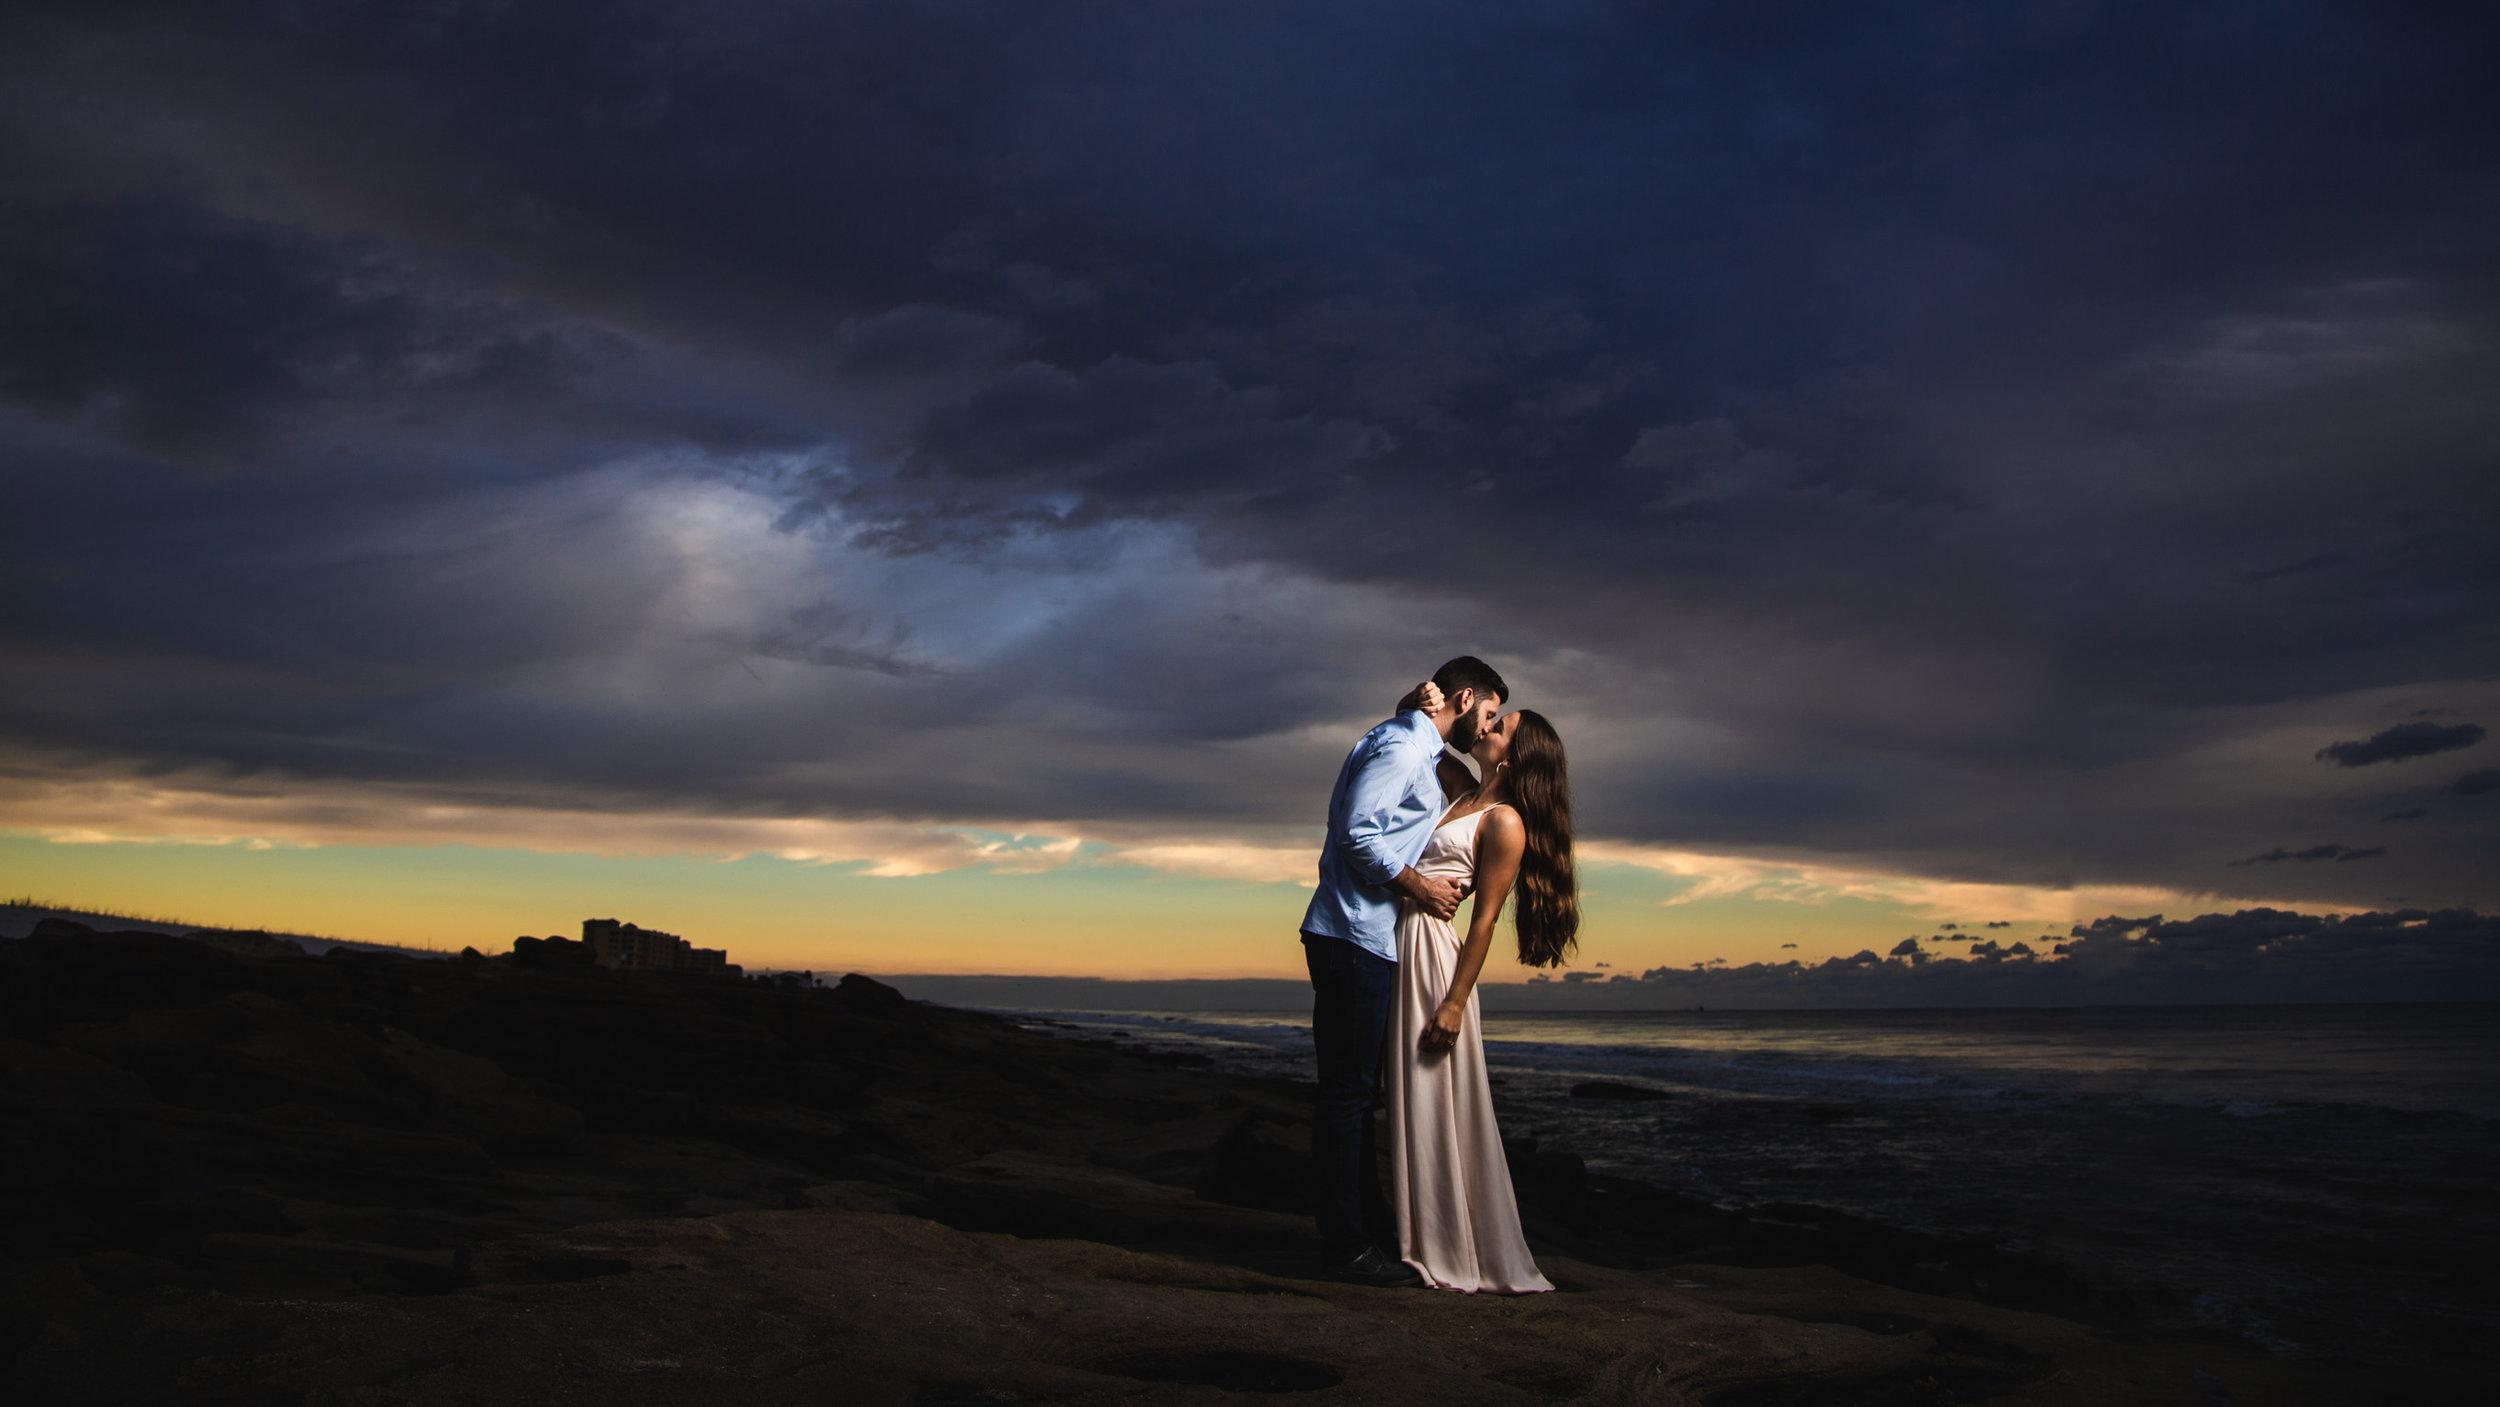 adam-szarmack-jacksonville-wedding-photographer-palm-coast-washing-oaks-garden-state-park-engagement-45.jpg